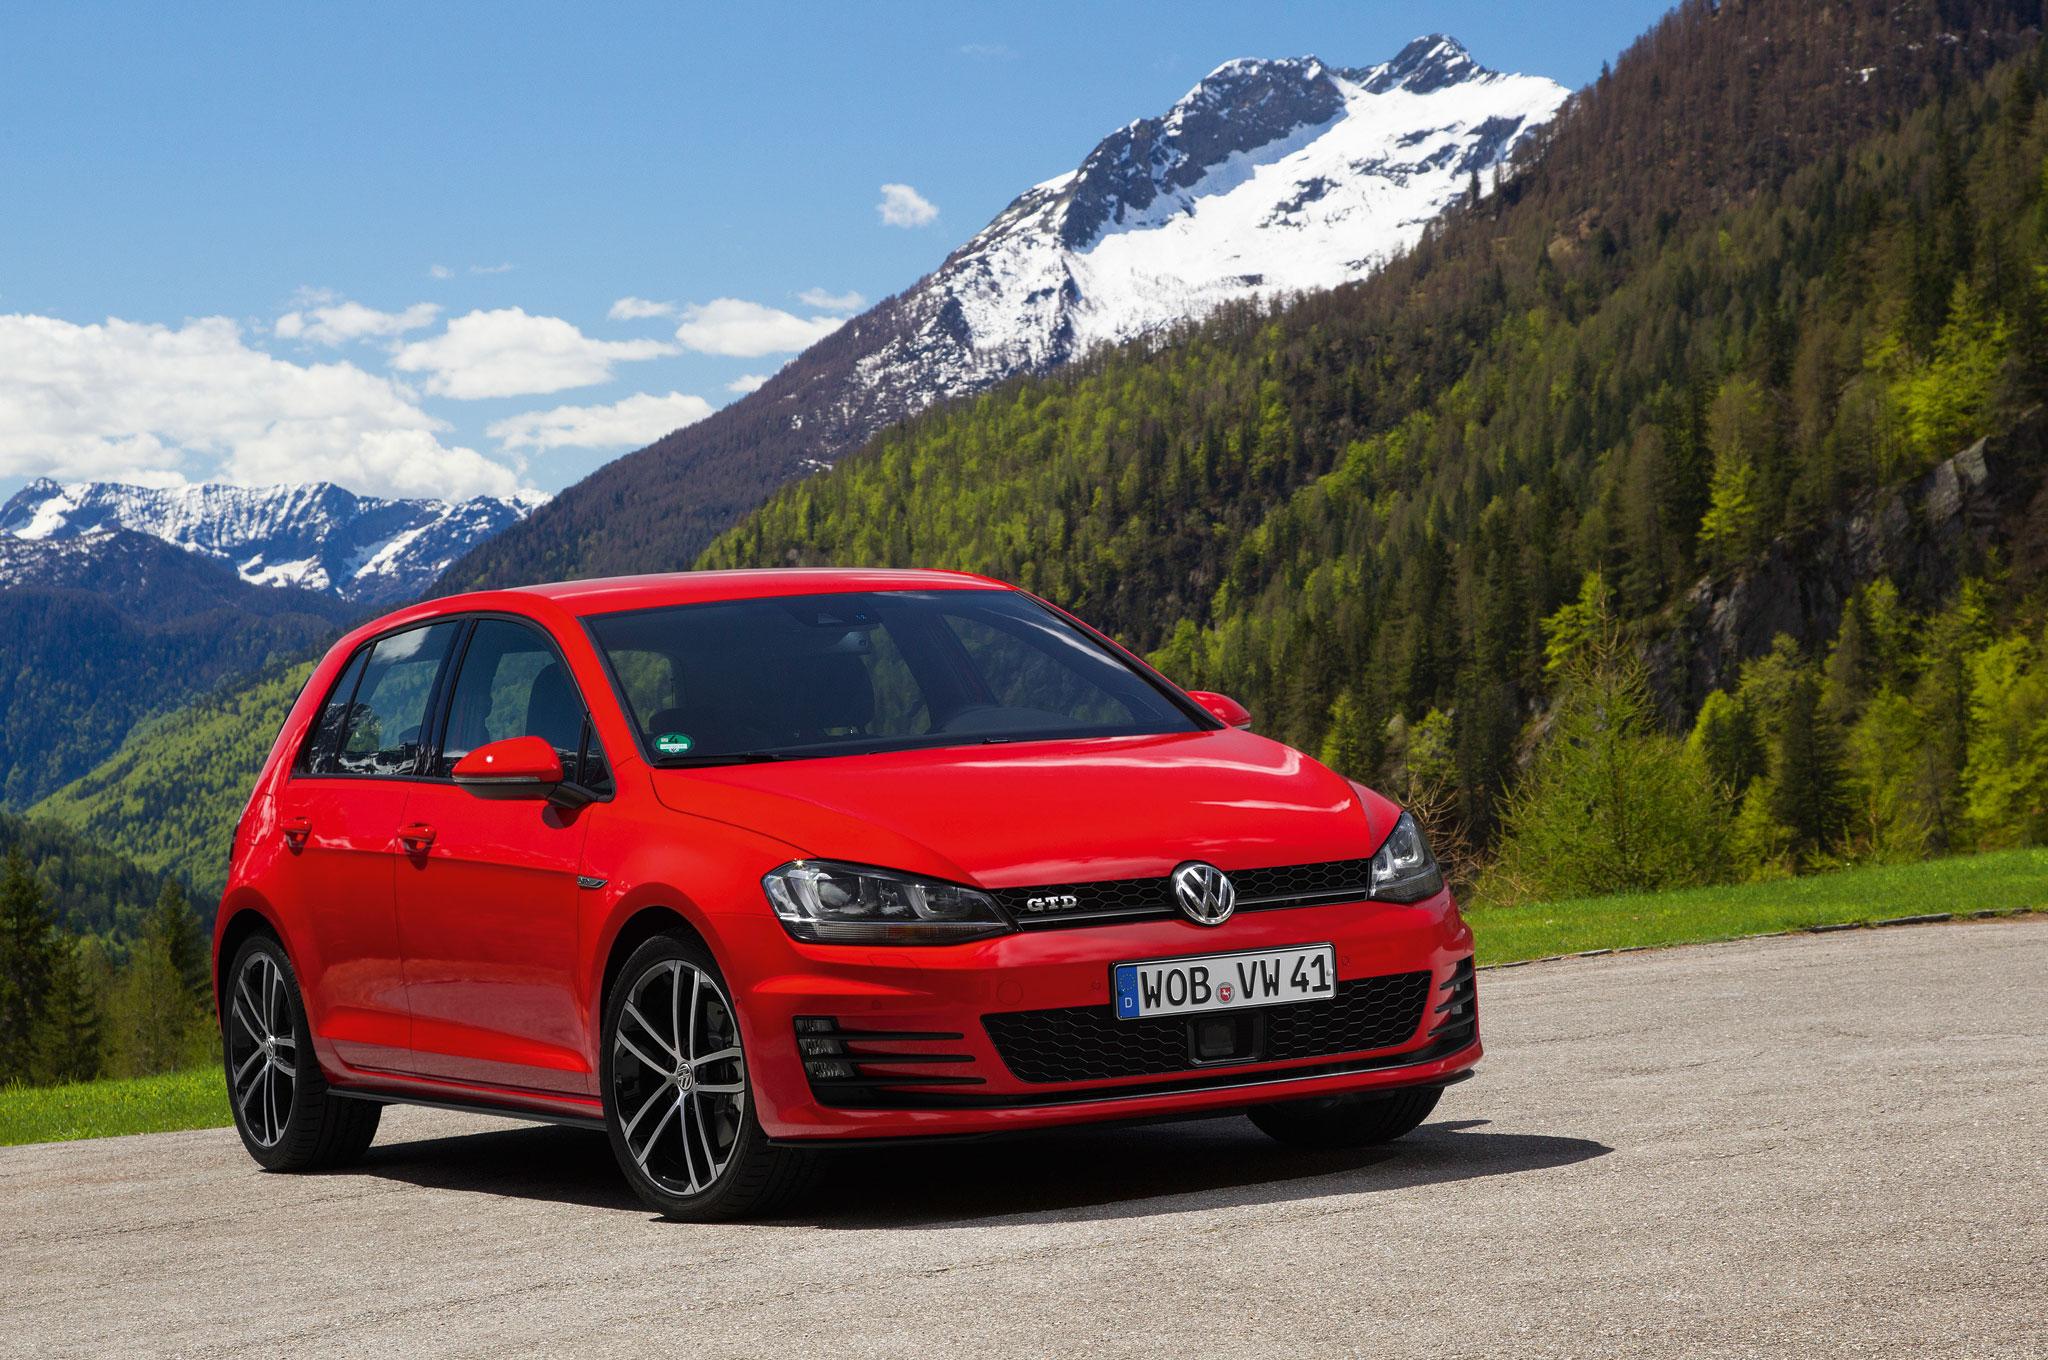 2014 Volkswagen GTD Front Right View1